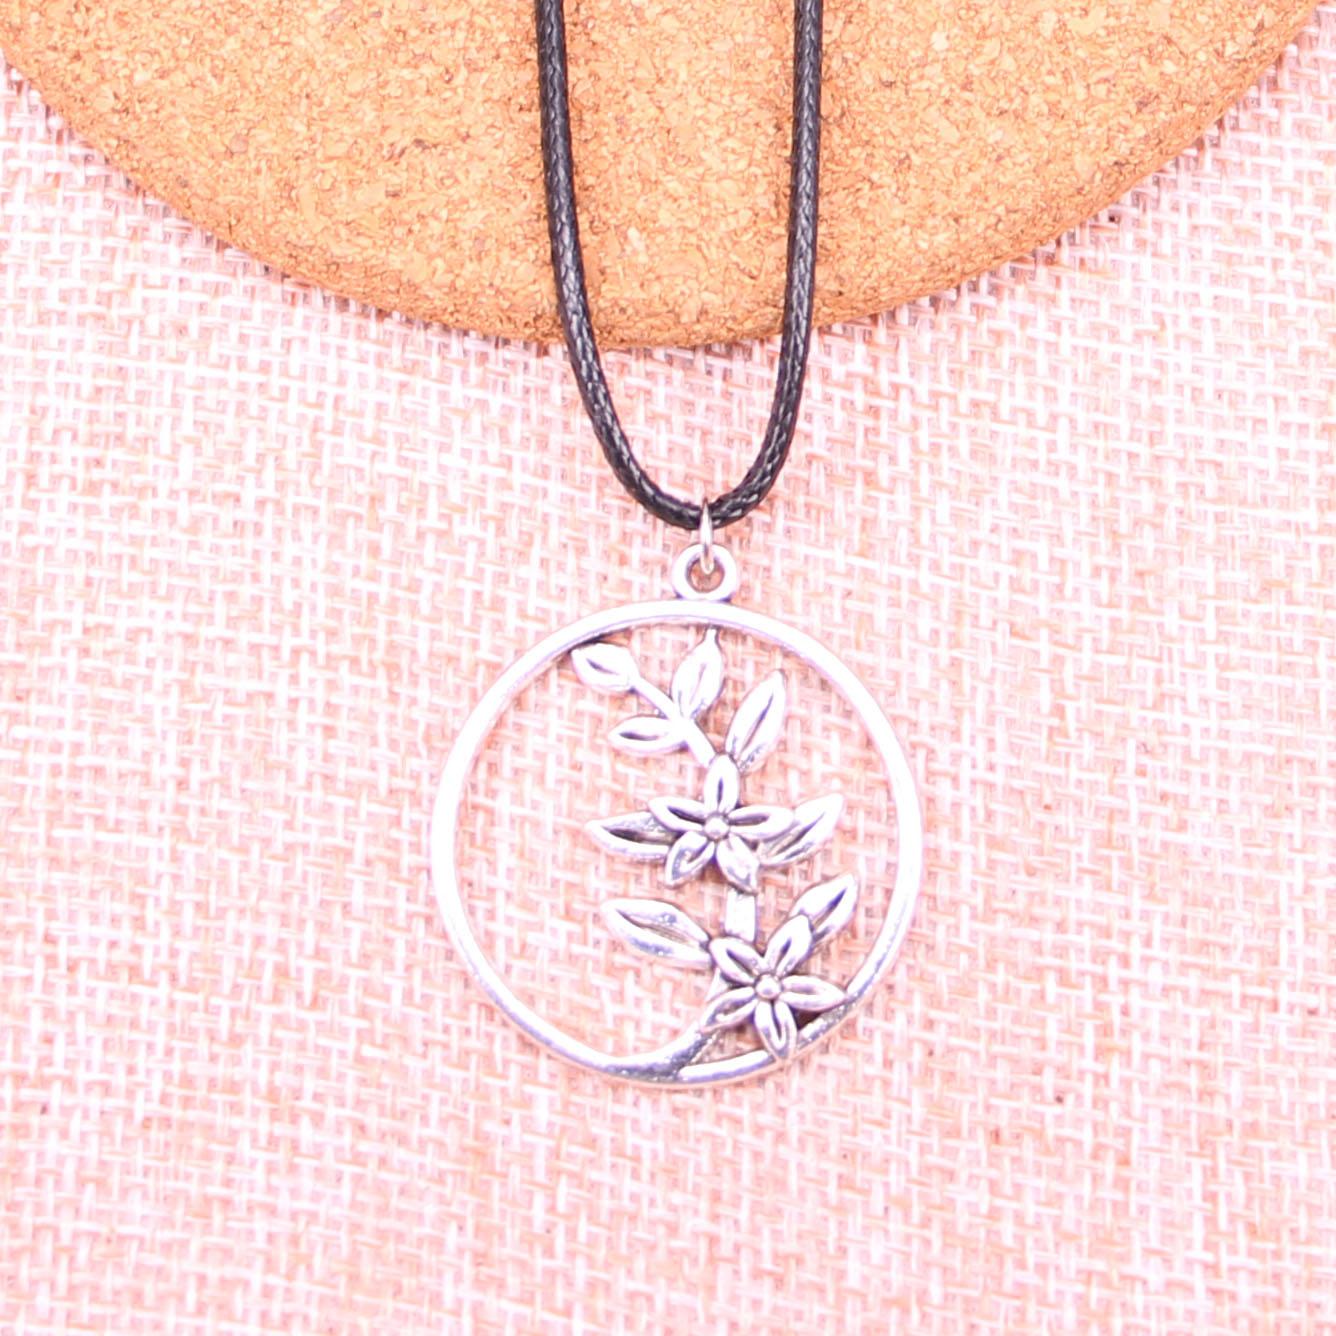 20Pcs Antique Silver Color circle flower branch Pendant 29mm Leather Chain Necklace Black Leather Cord Necklace